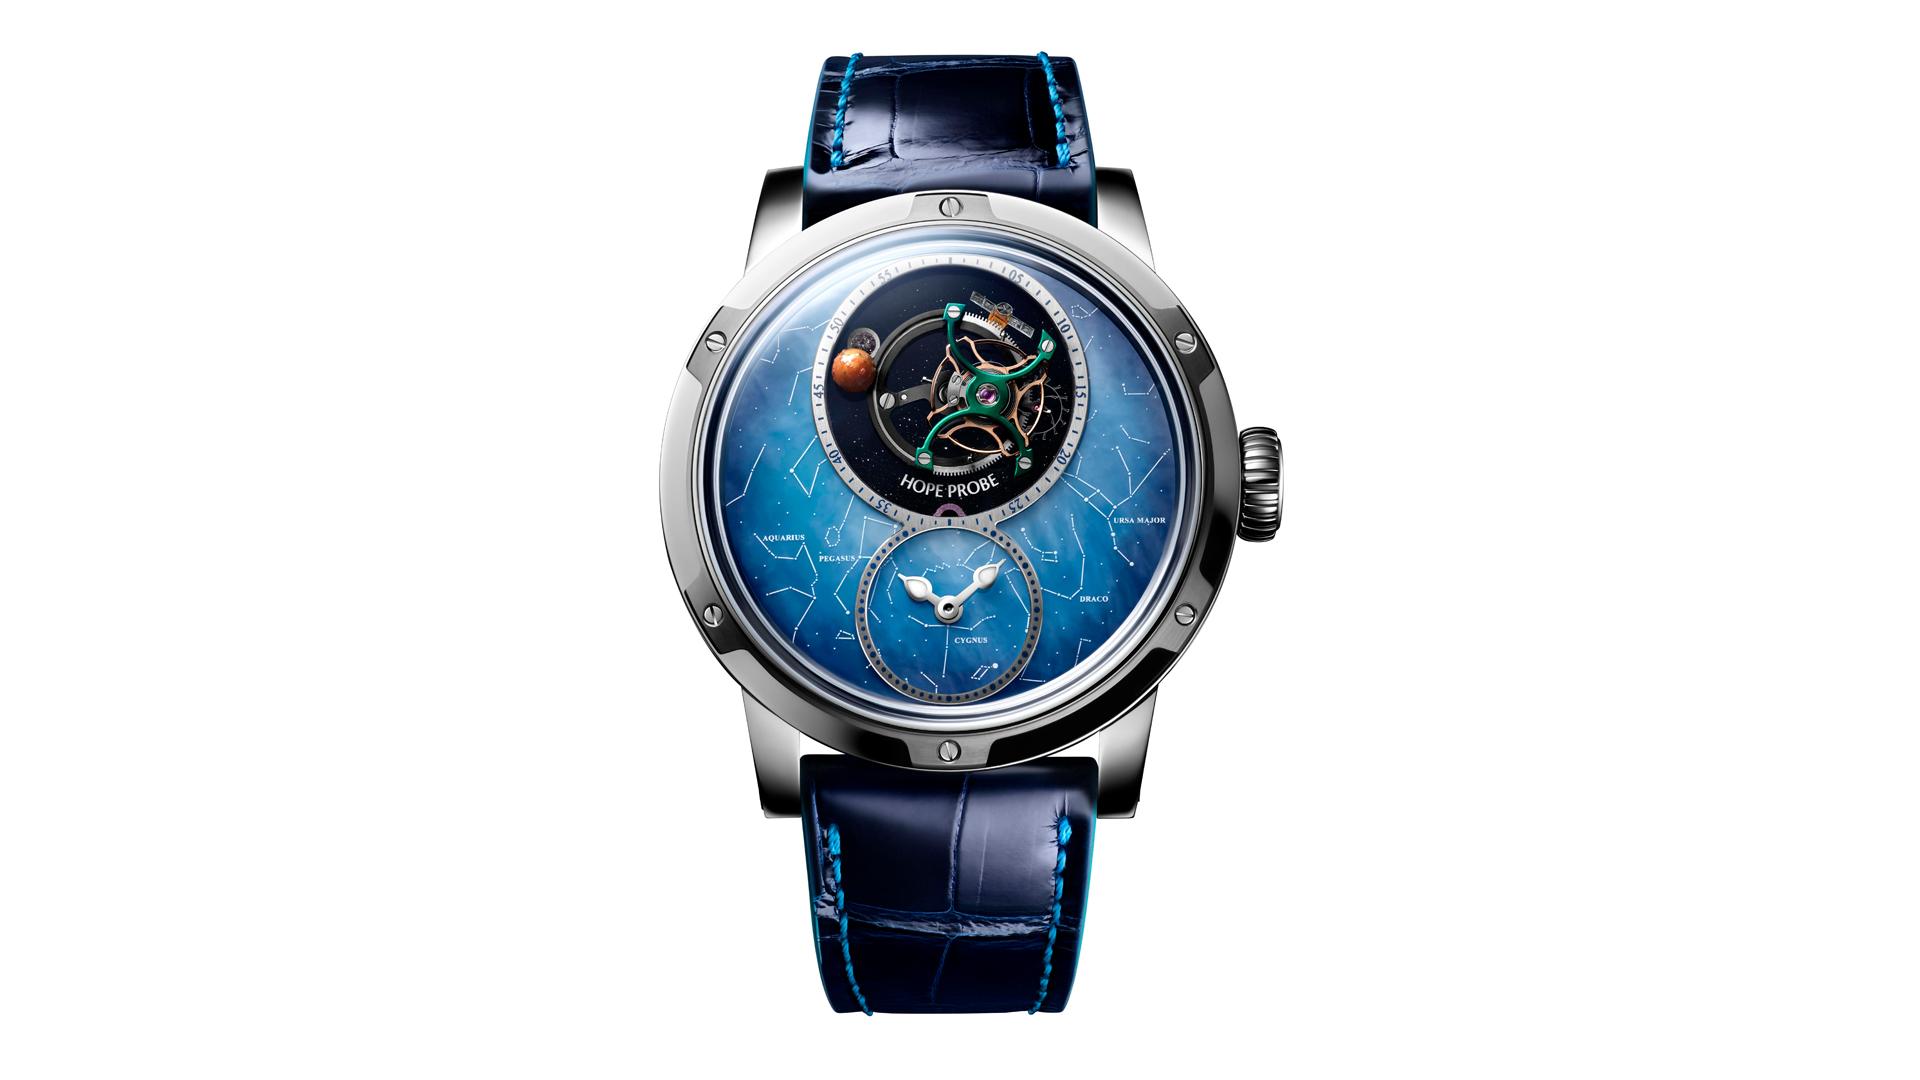 Hope Probe Tourbillon from Swiss watchmaker Louis Moinet